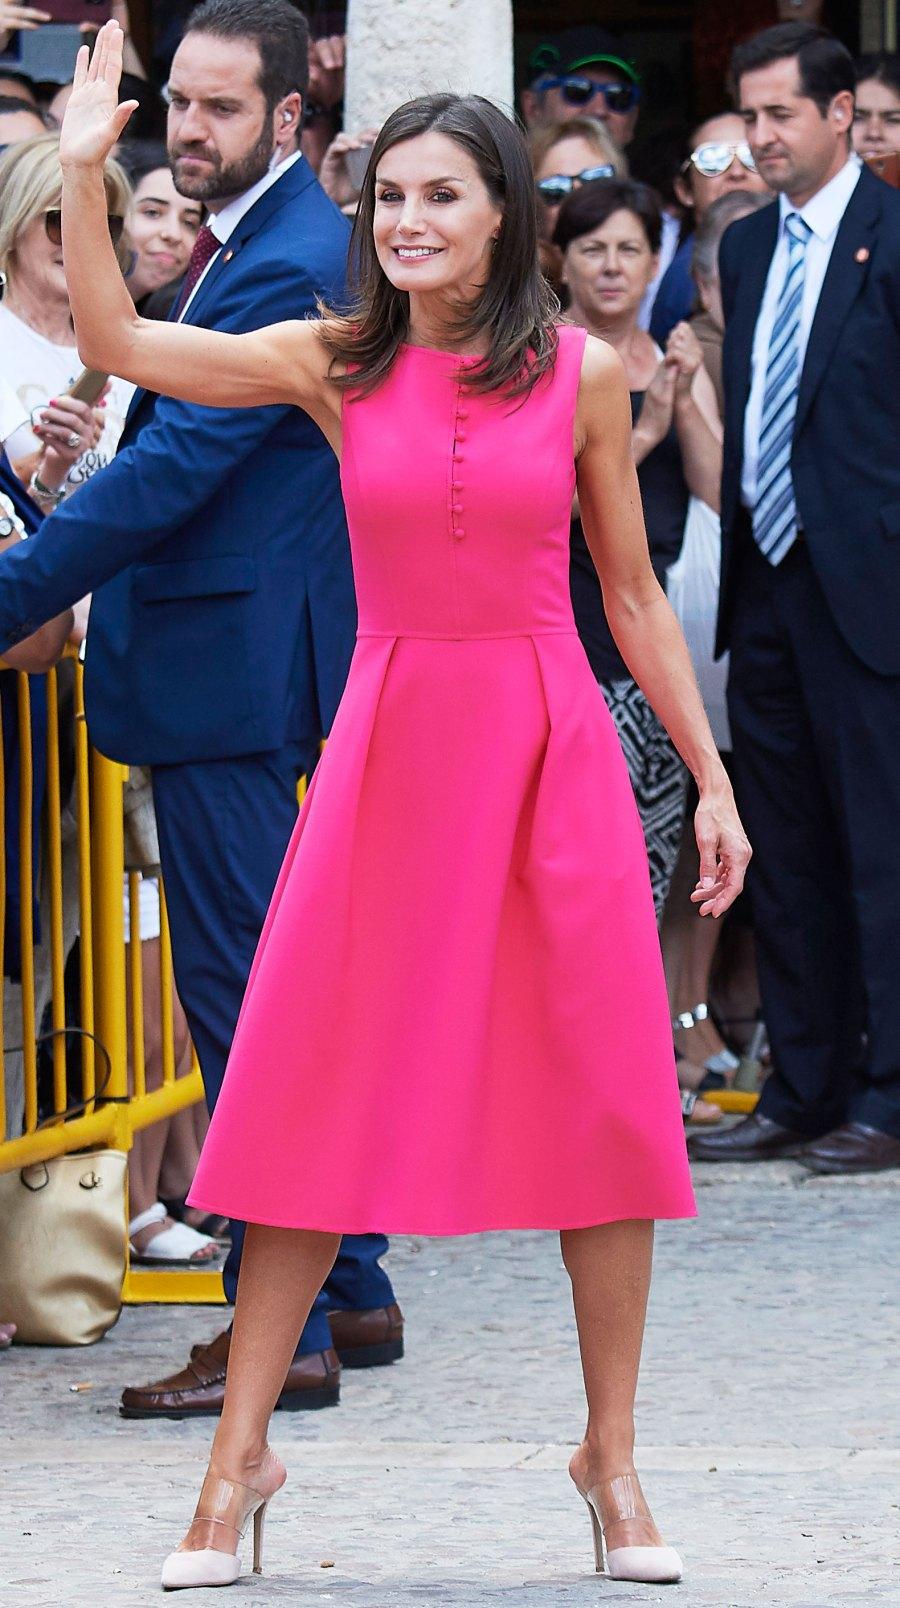 Queen Letizia Hot Pink Dress July 9, 2019